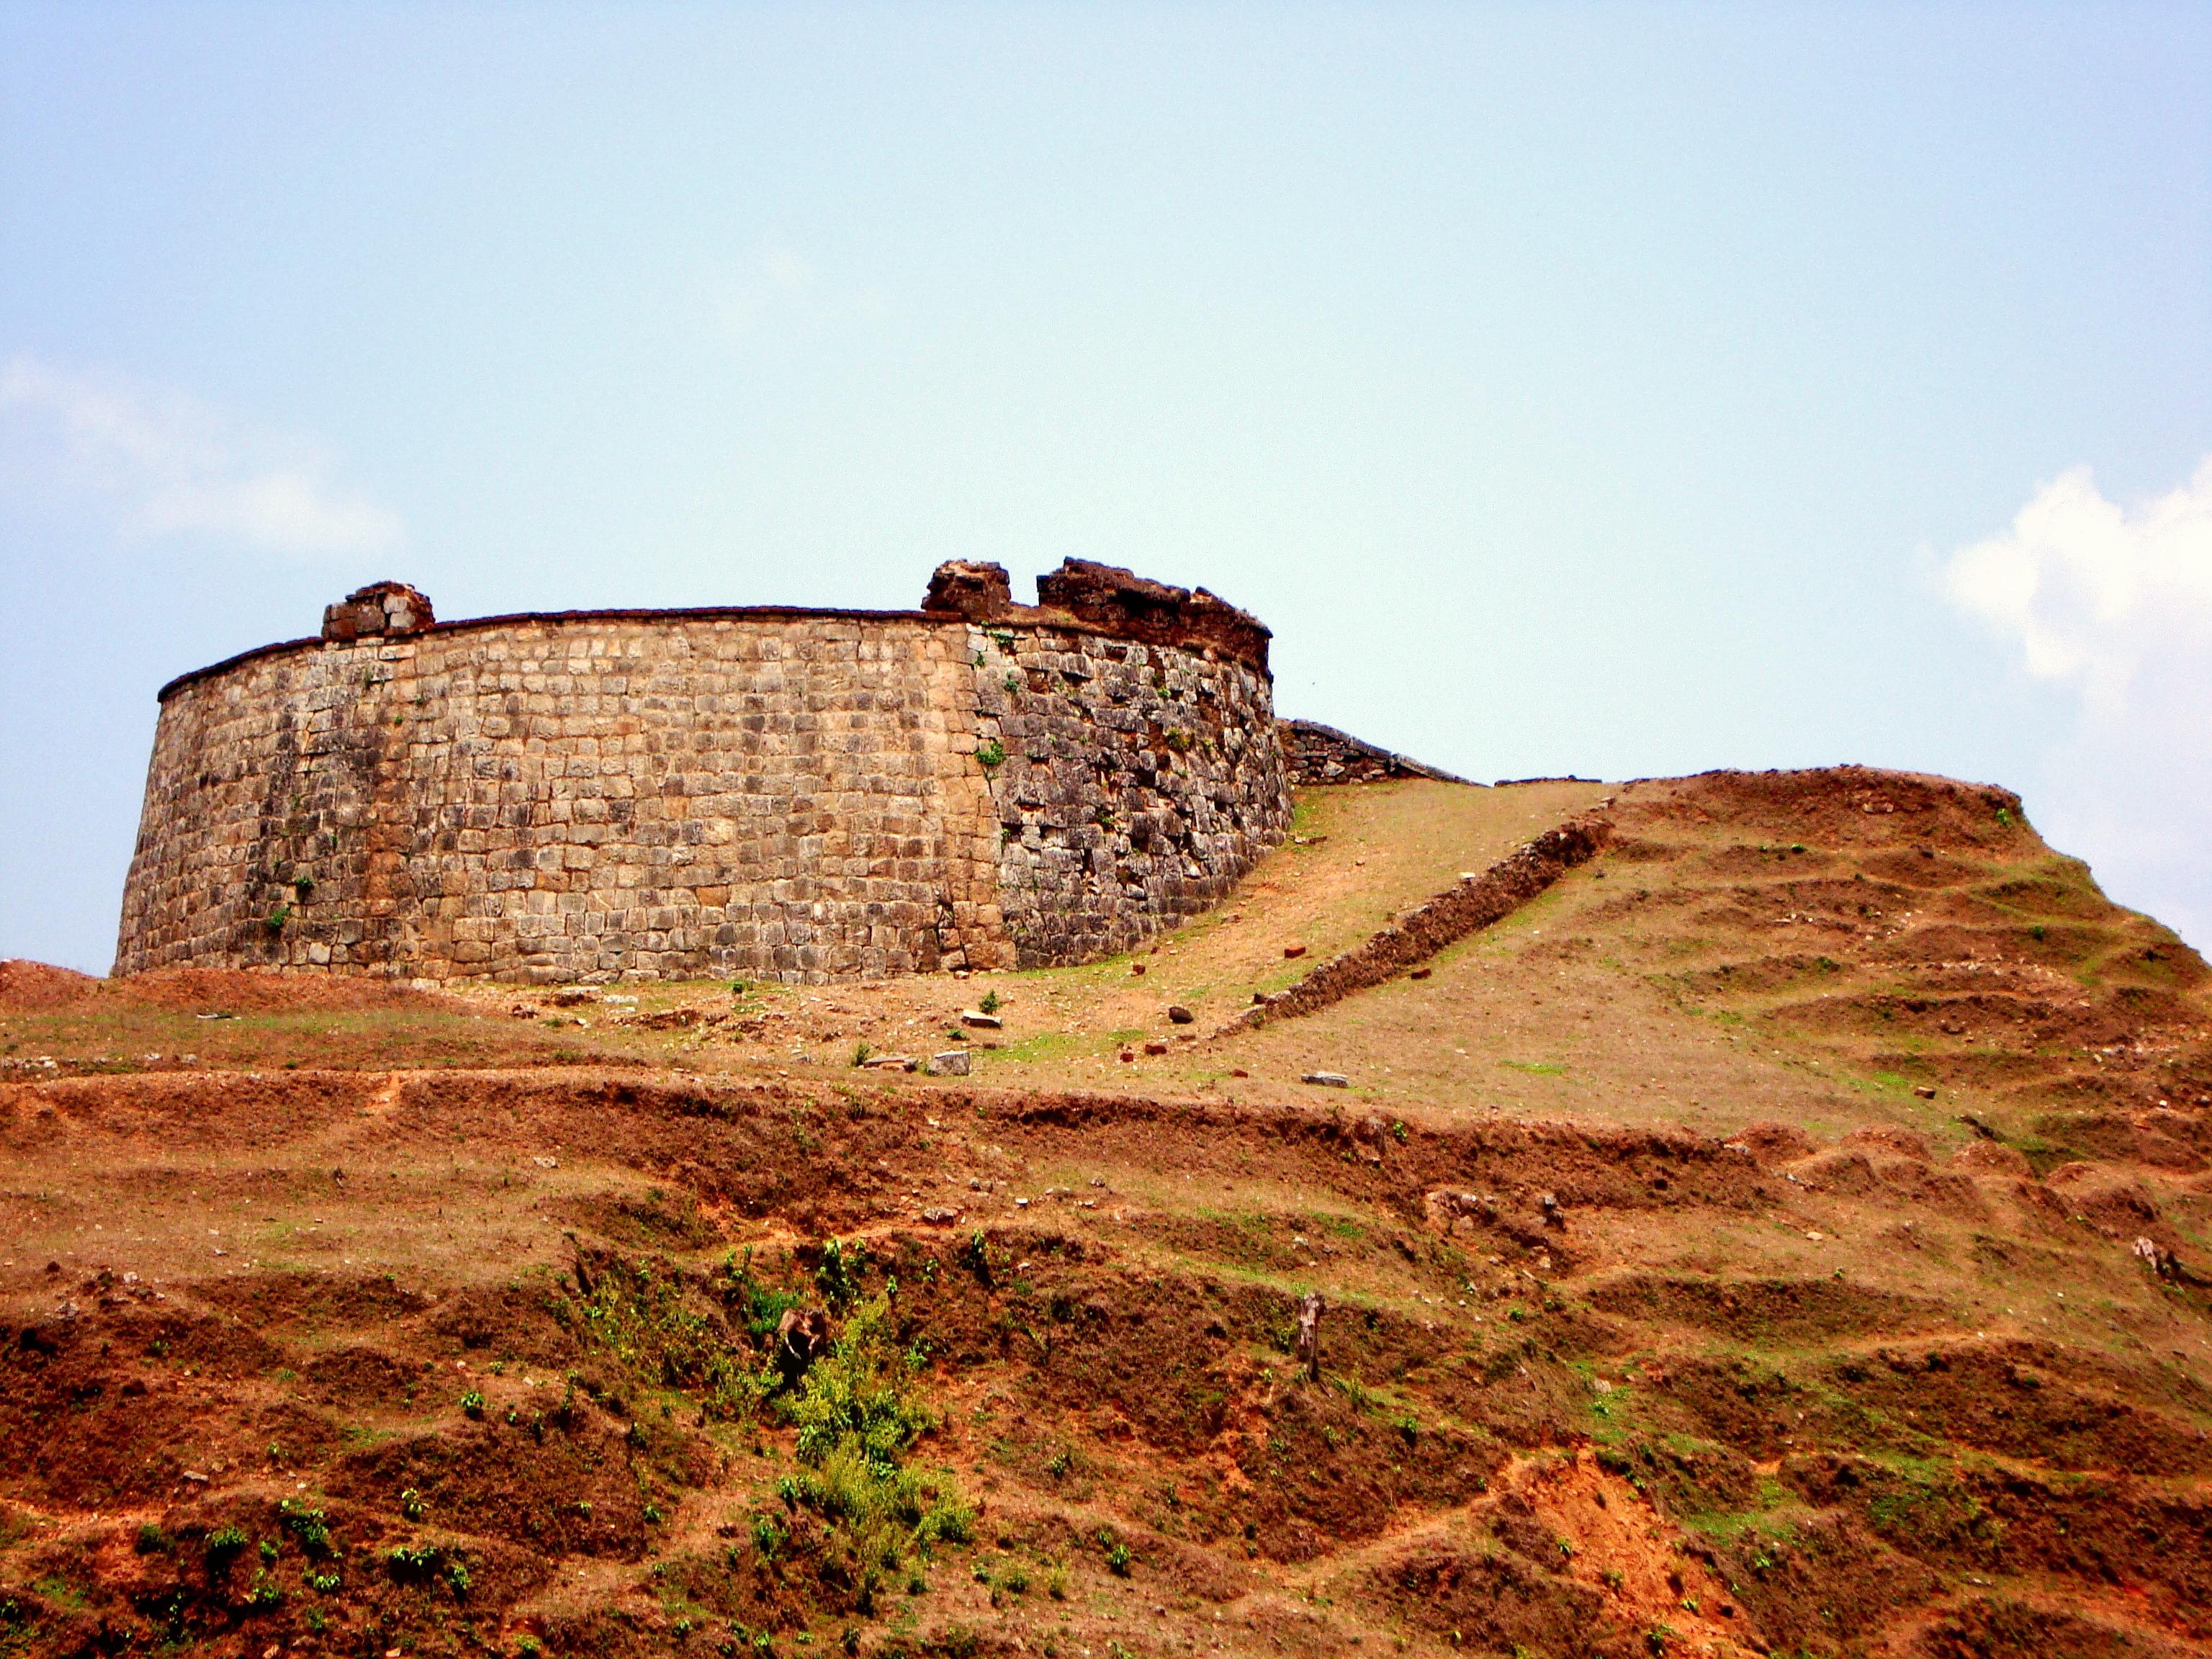 1479886440_watch_tower_of_nagara_fort.jpg